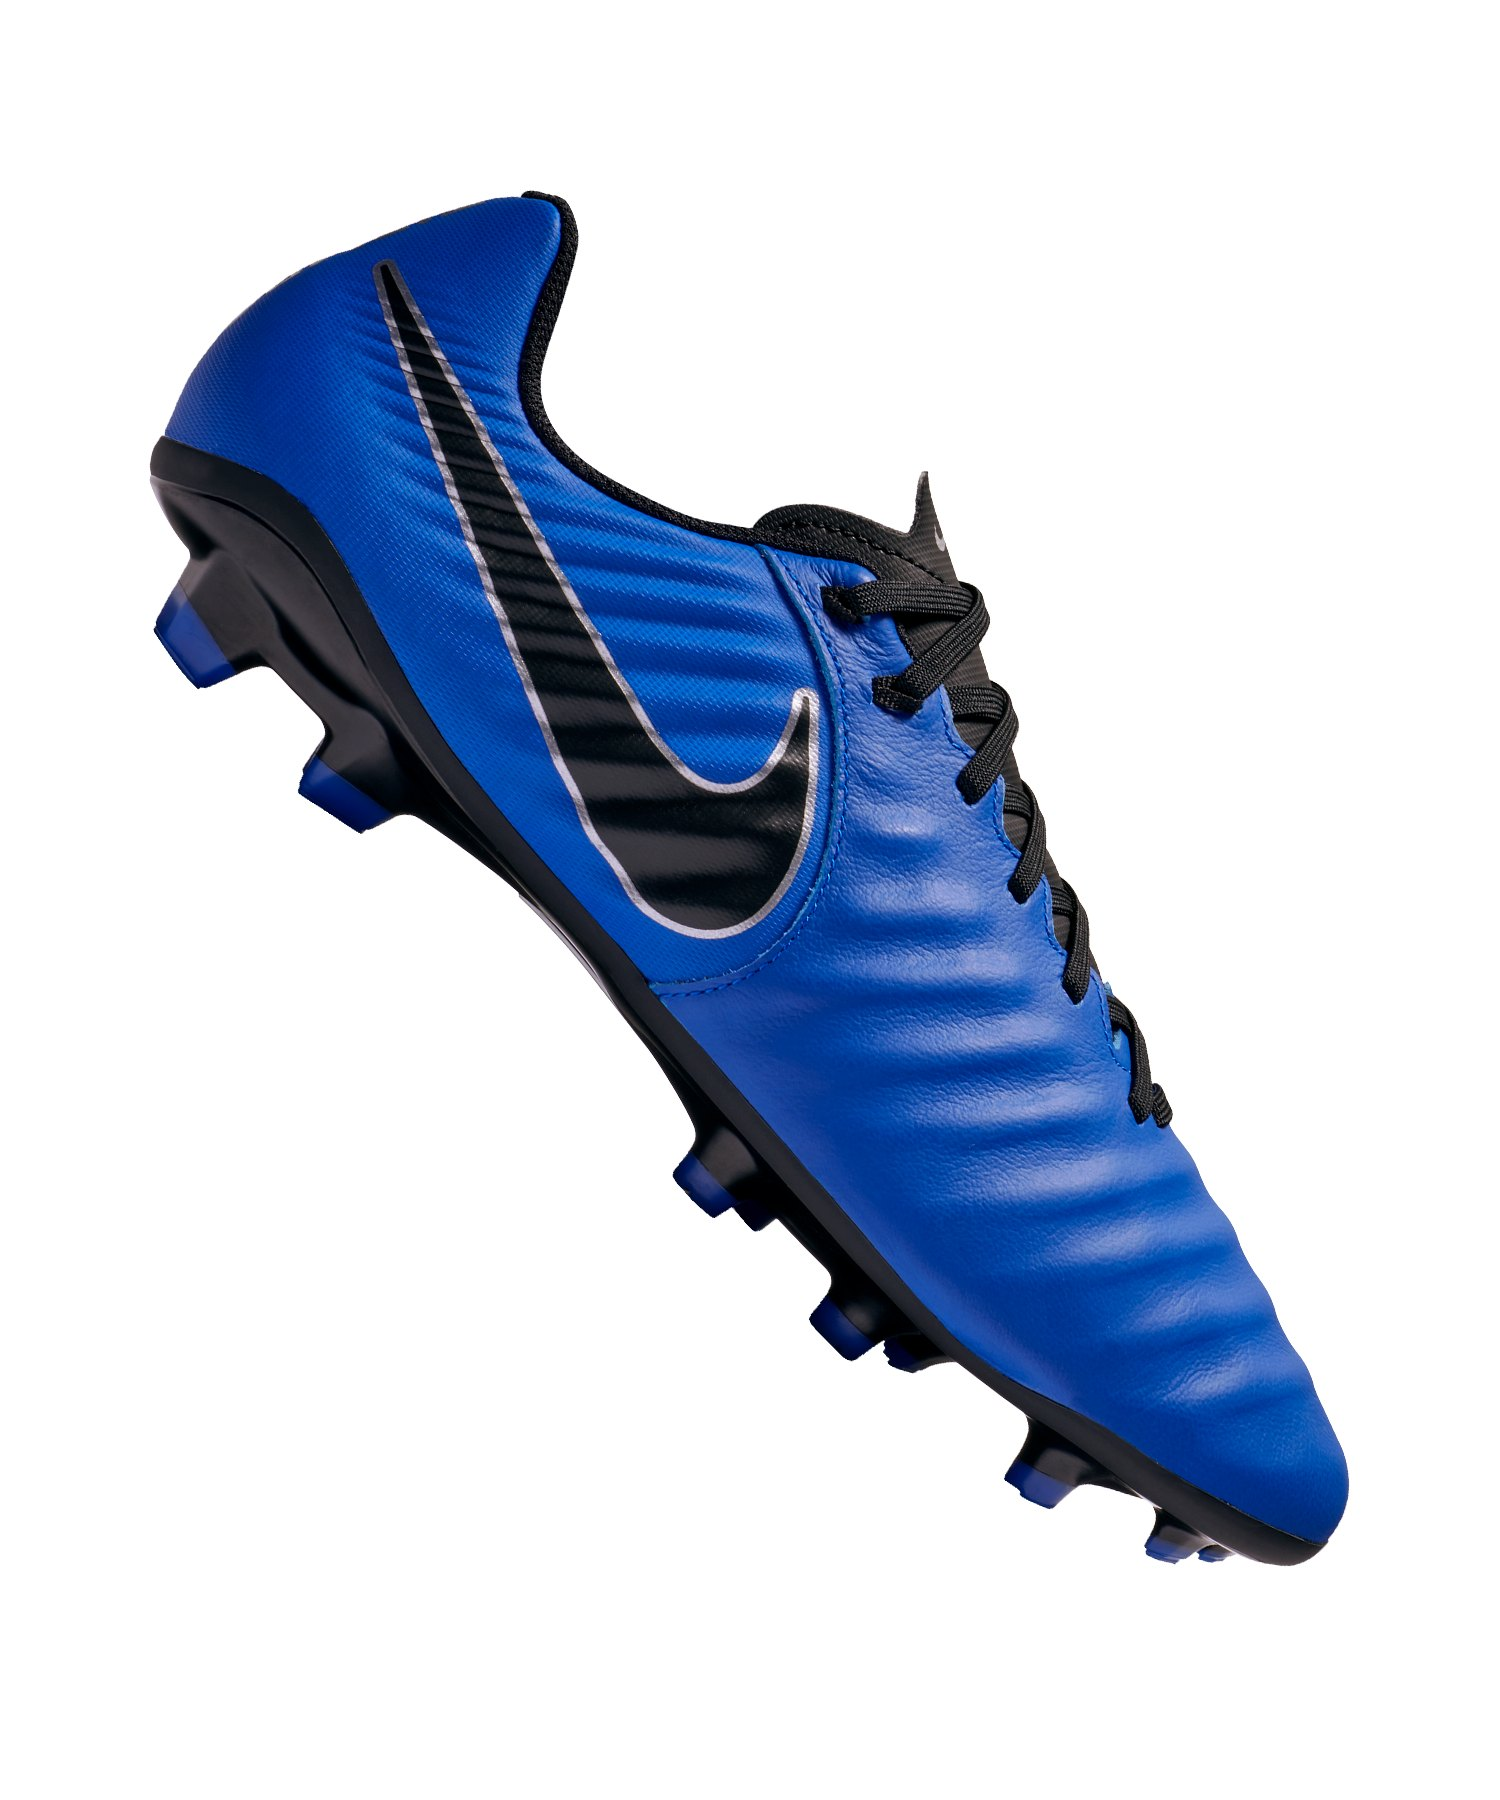 reputable site fd66c f8e68 Nike Tiempo Legend VII Academy FG Blau F400